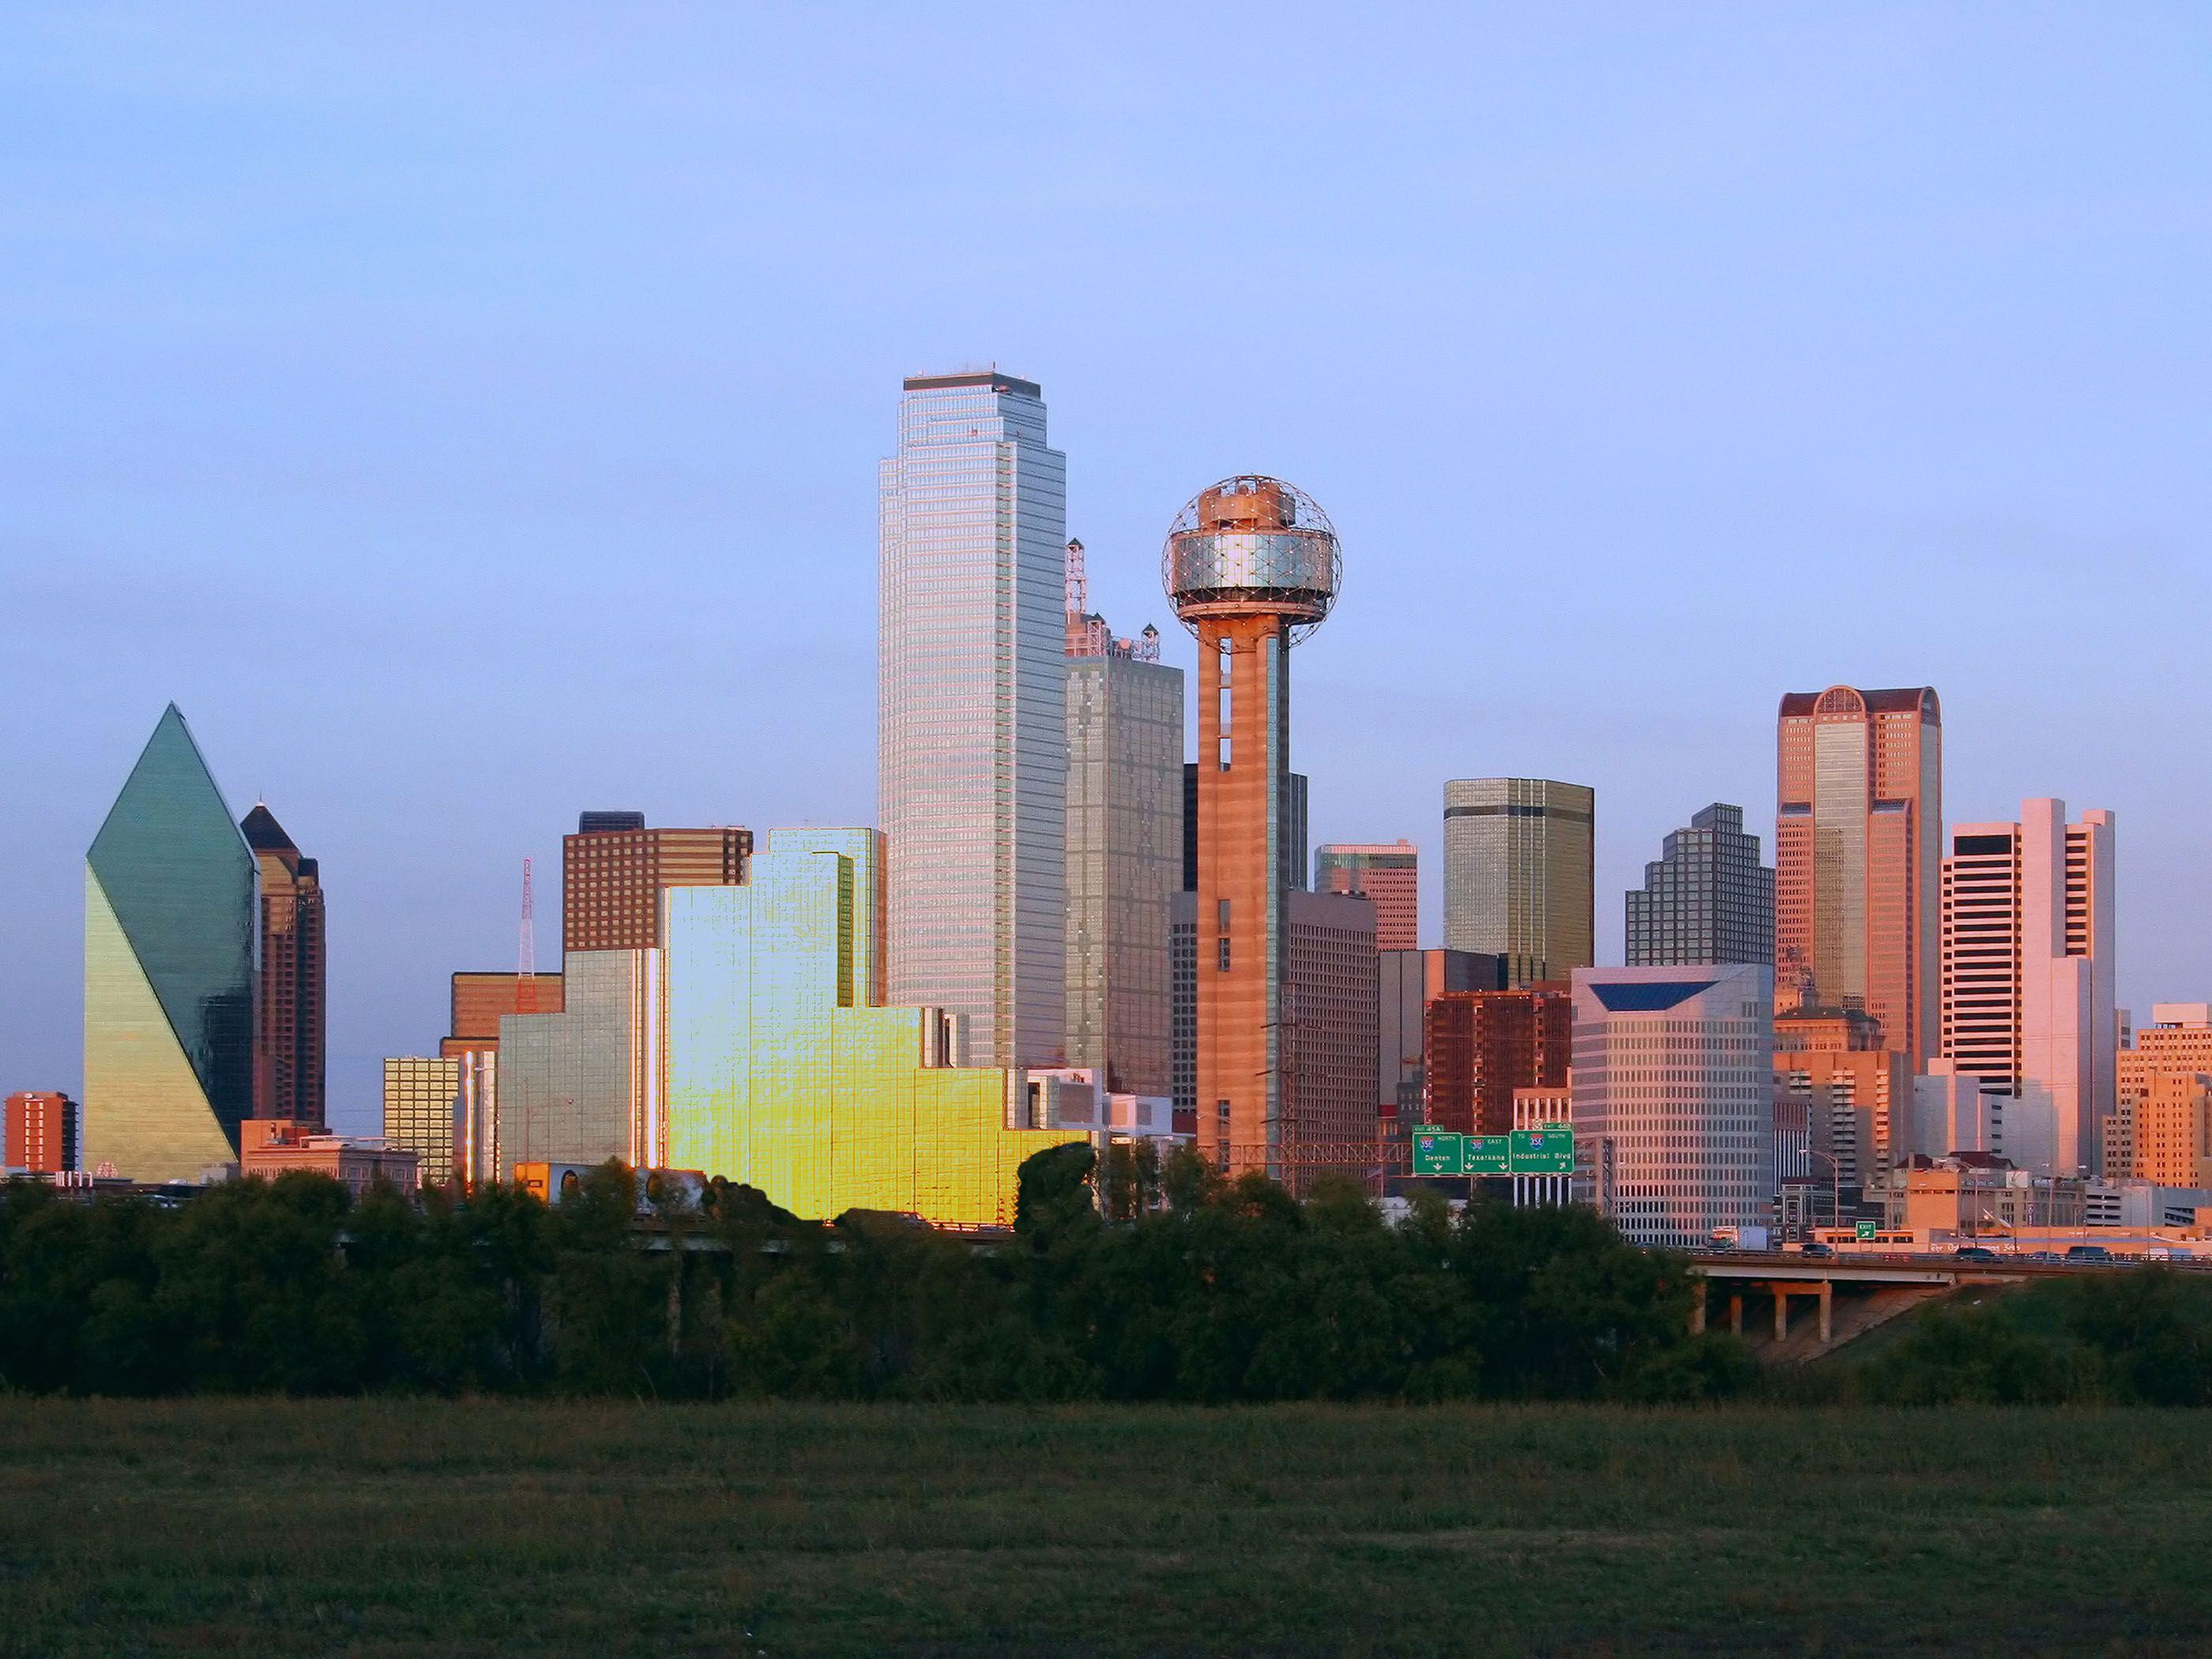 Dallas City Dallas skyline, Dallas city, Skyline